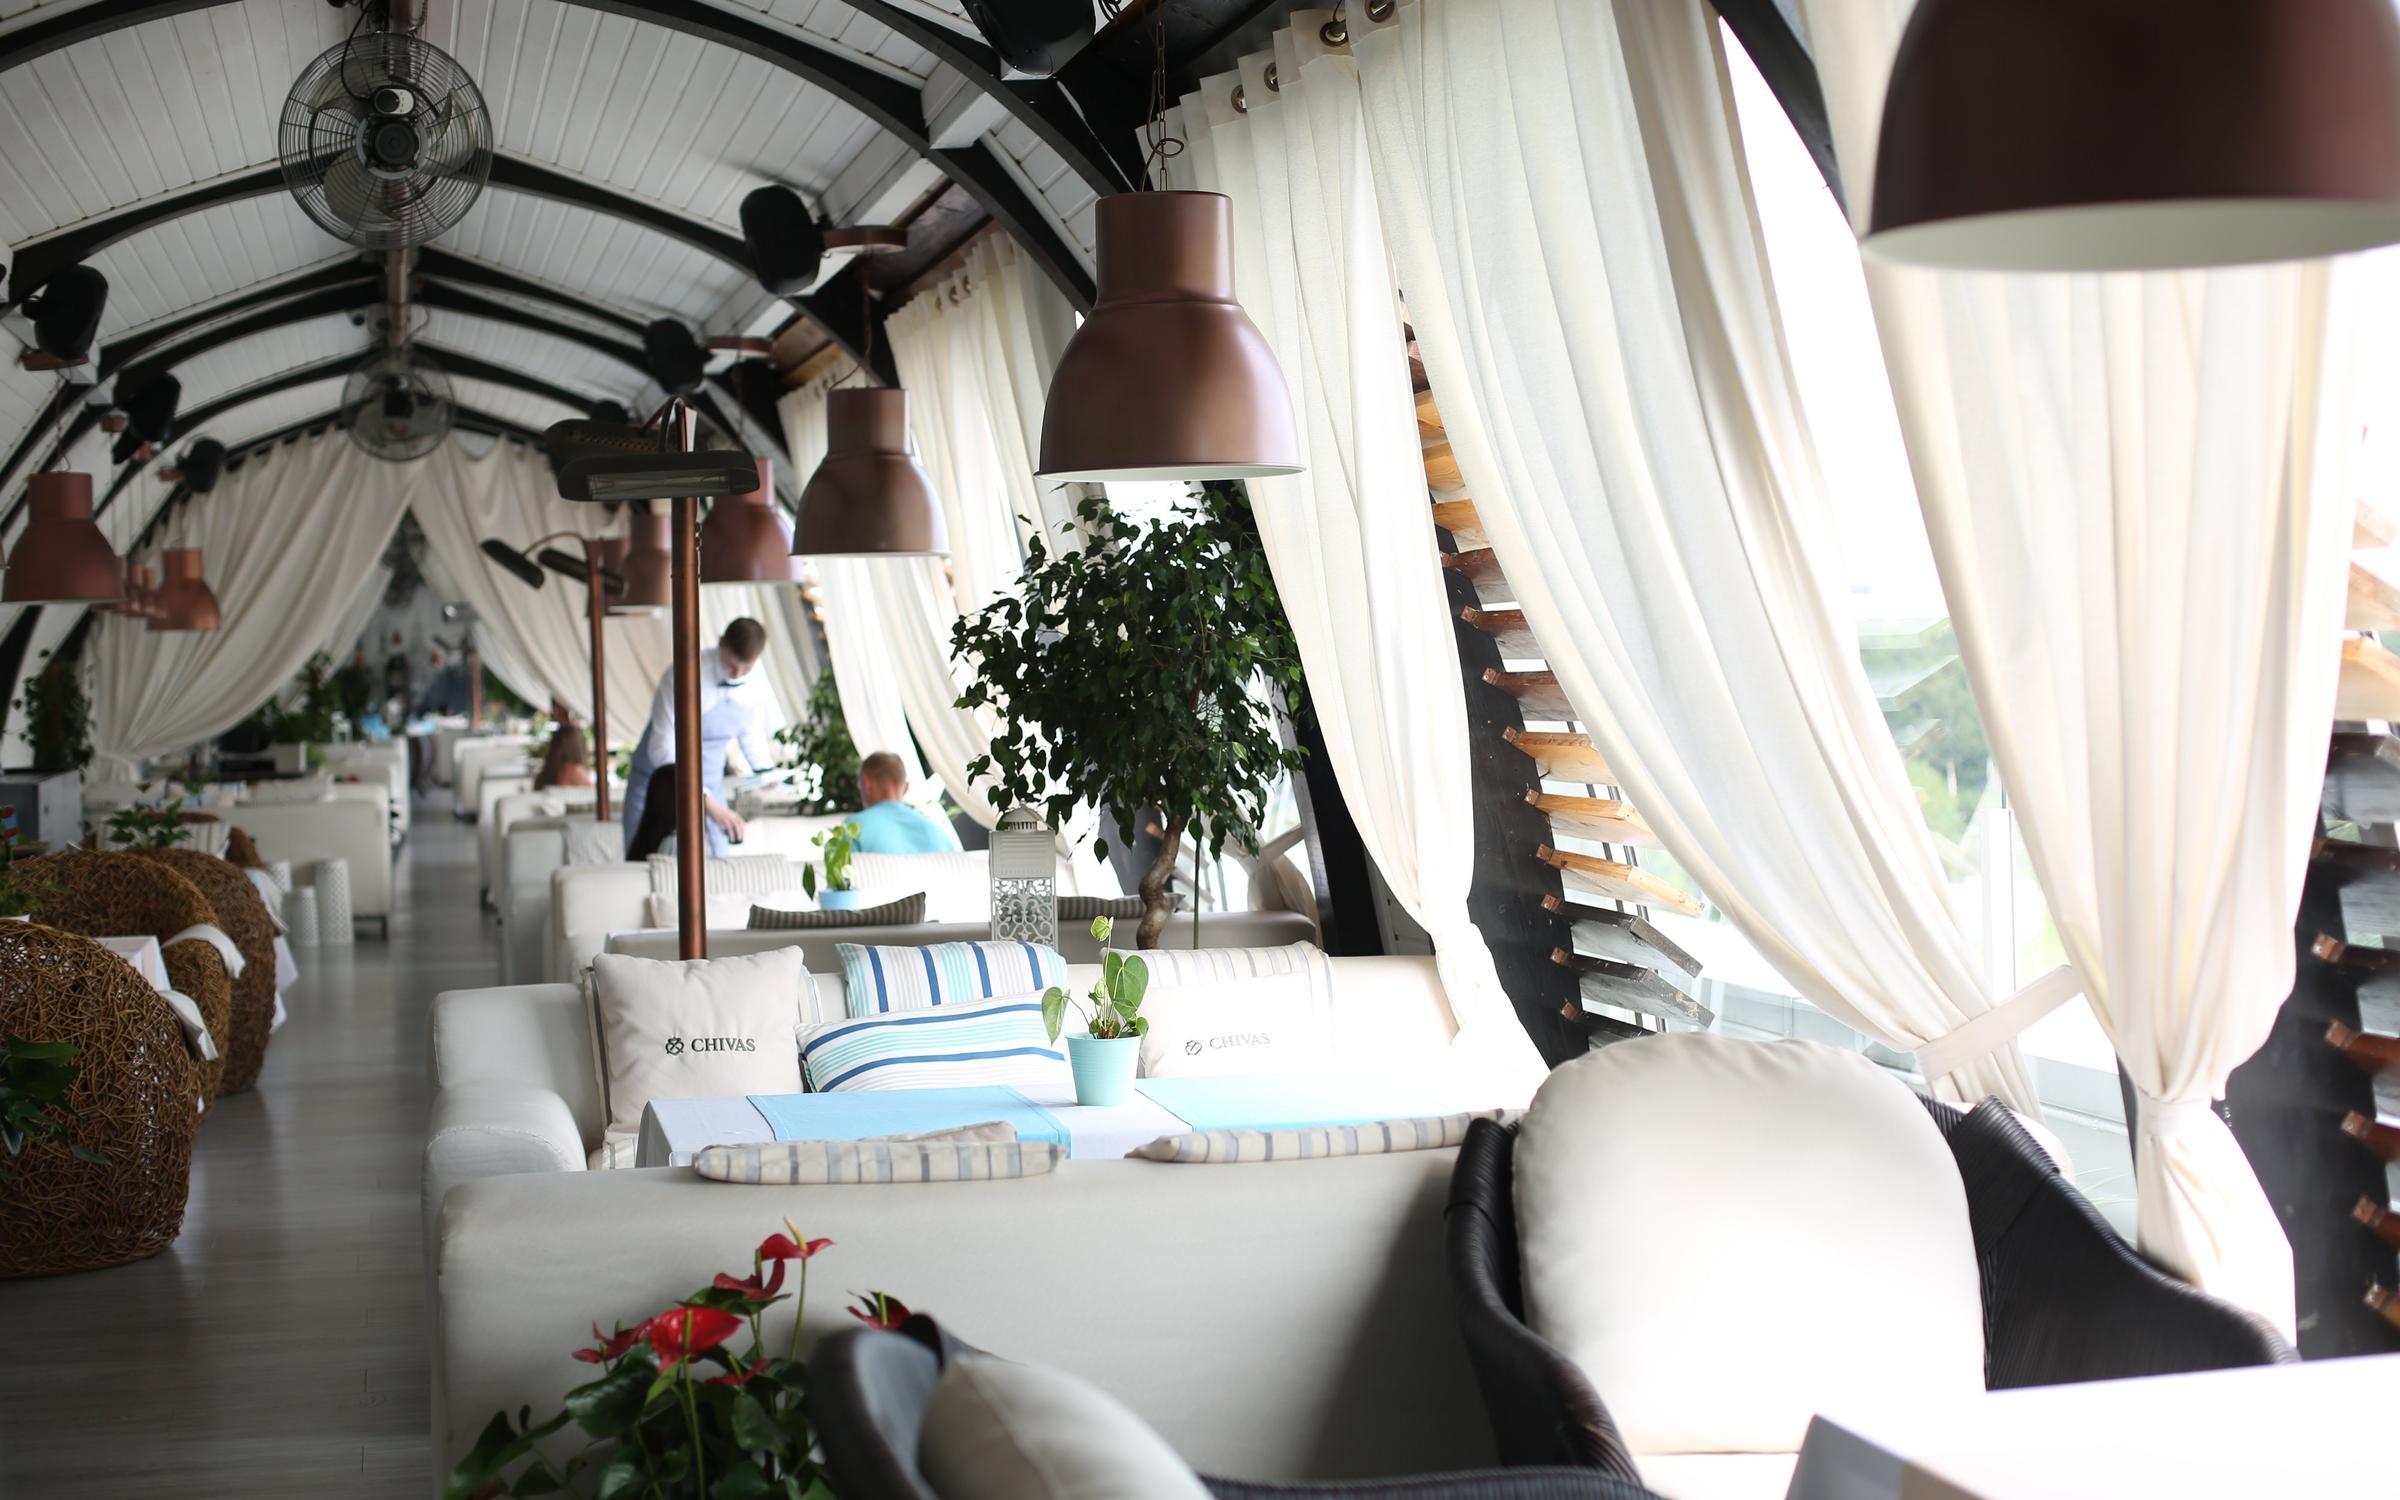 фотография Ресторана Spettacolo в ТЦ Времена года, на 5 этаже